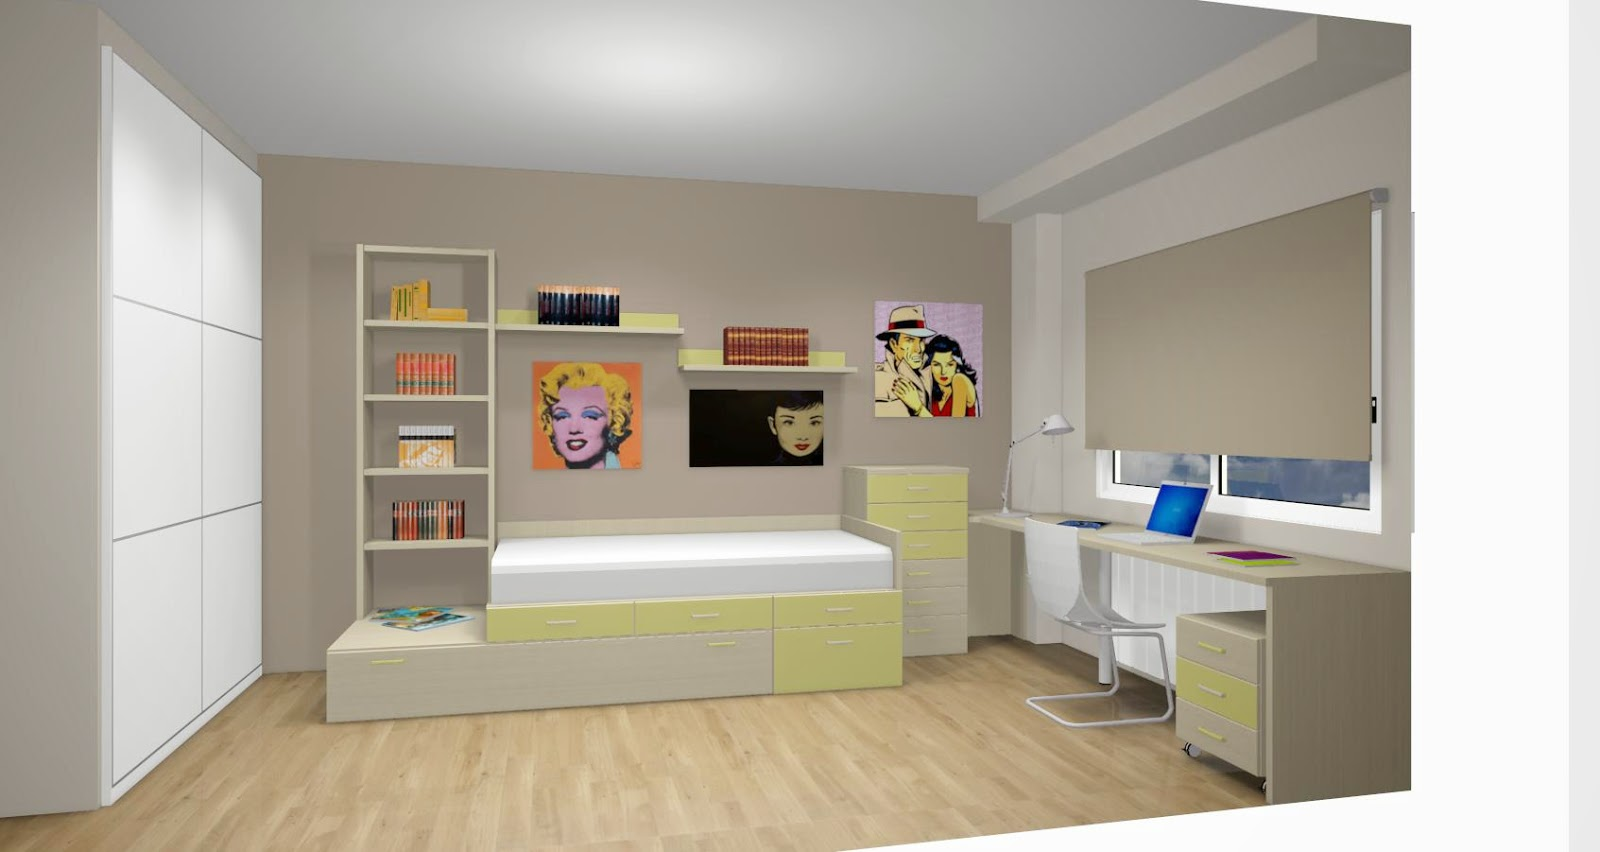 Dise o de cuartos o dormitorios juveniles for Programa decoracion habitaciones